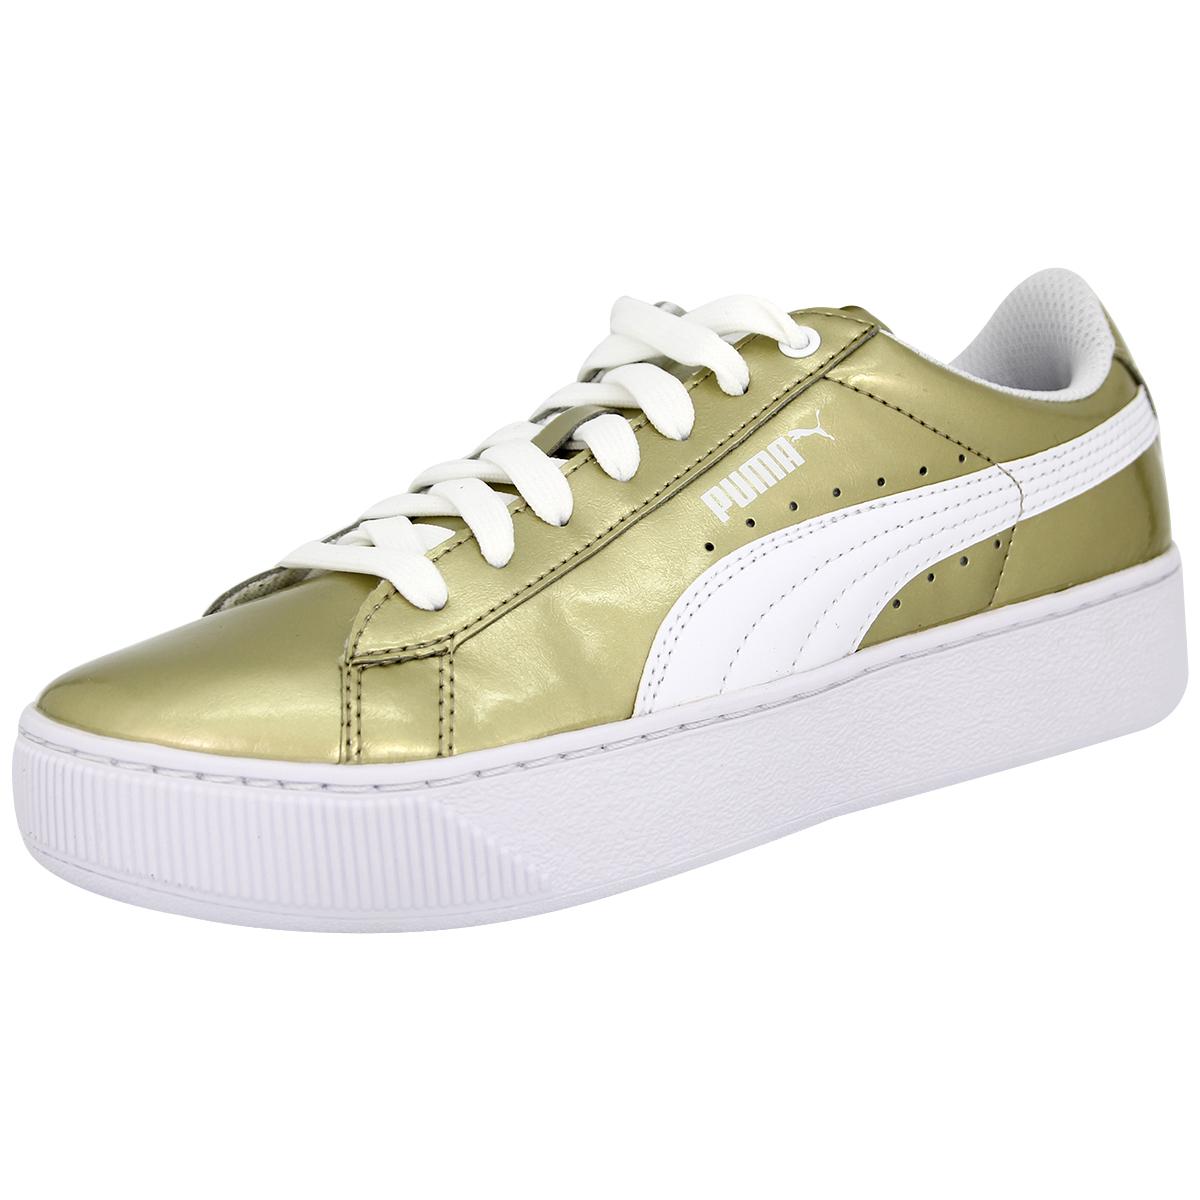 Sneakers Softfoam Chaussures Platform Vikky Puma Eur Mode Femme 34 x17anqz